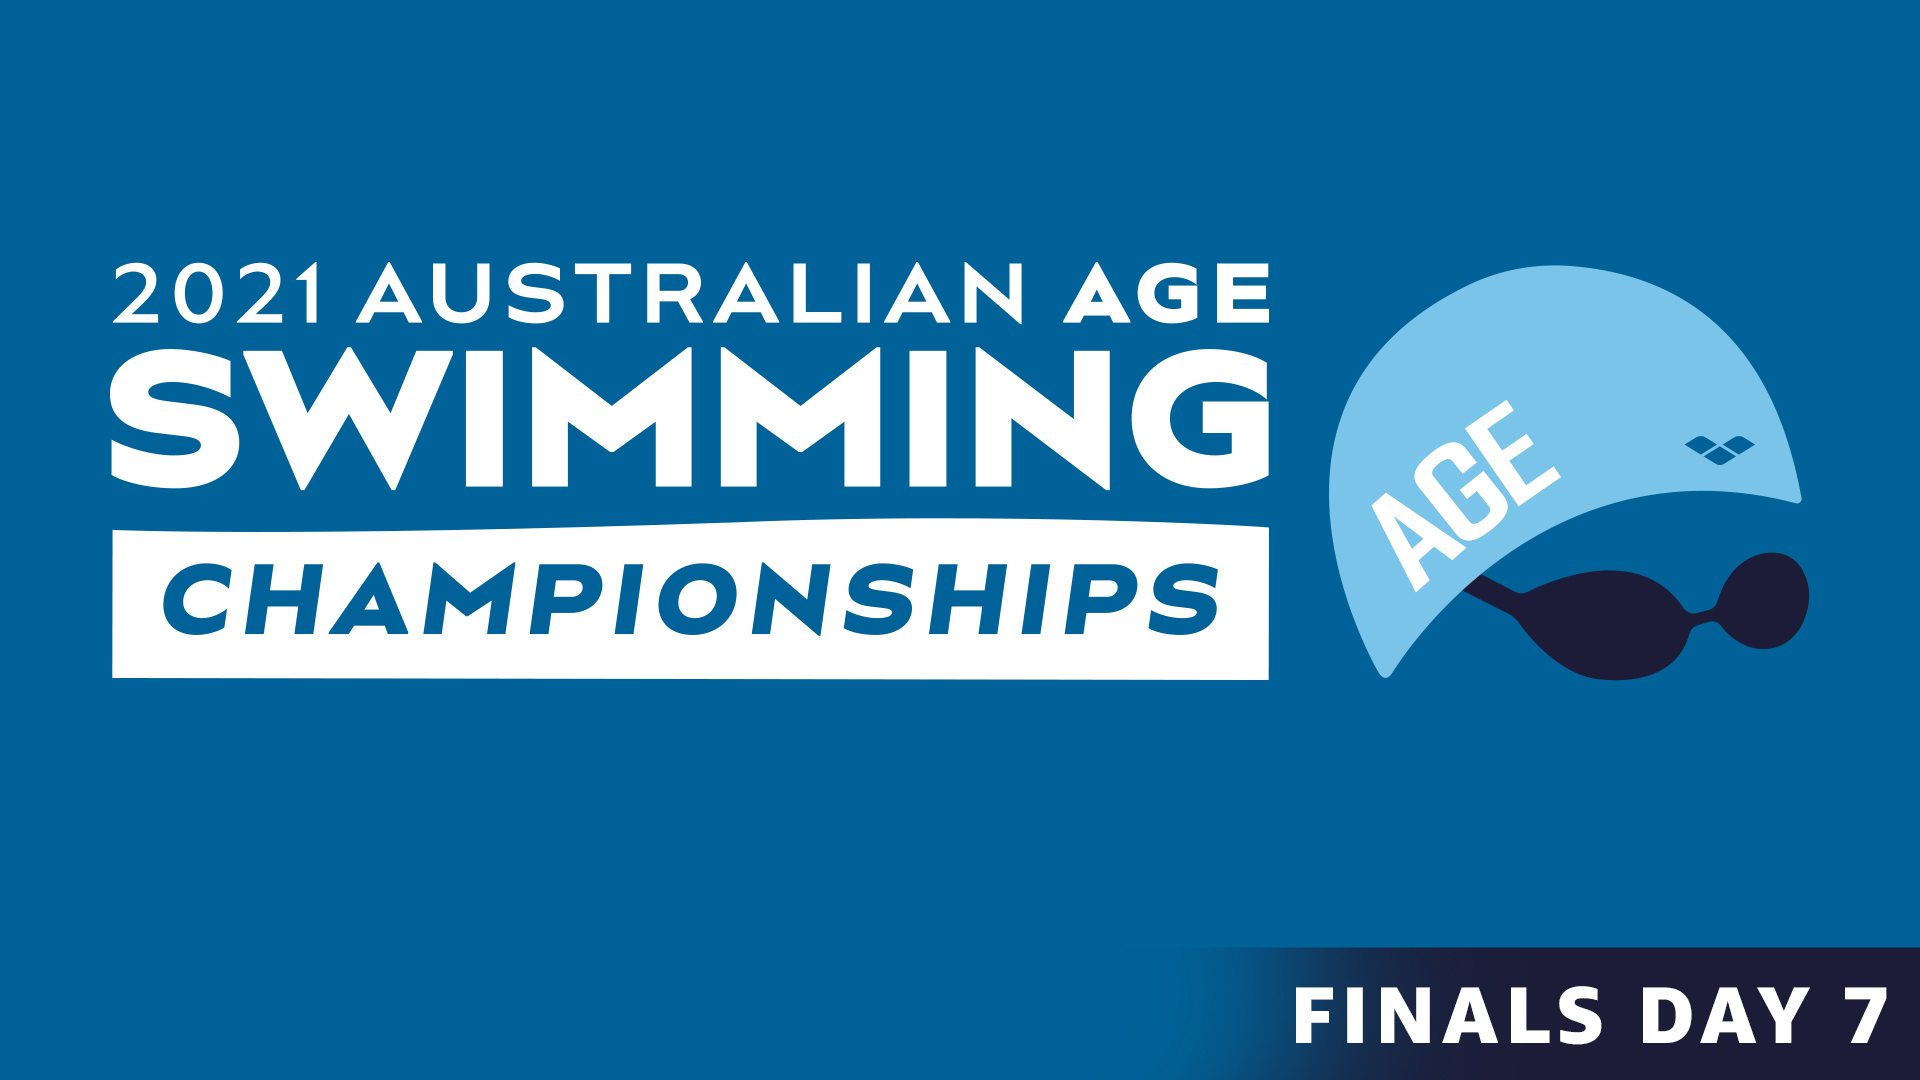 Australian Age Swimming Championships: Day 7 Finals